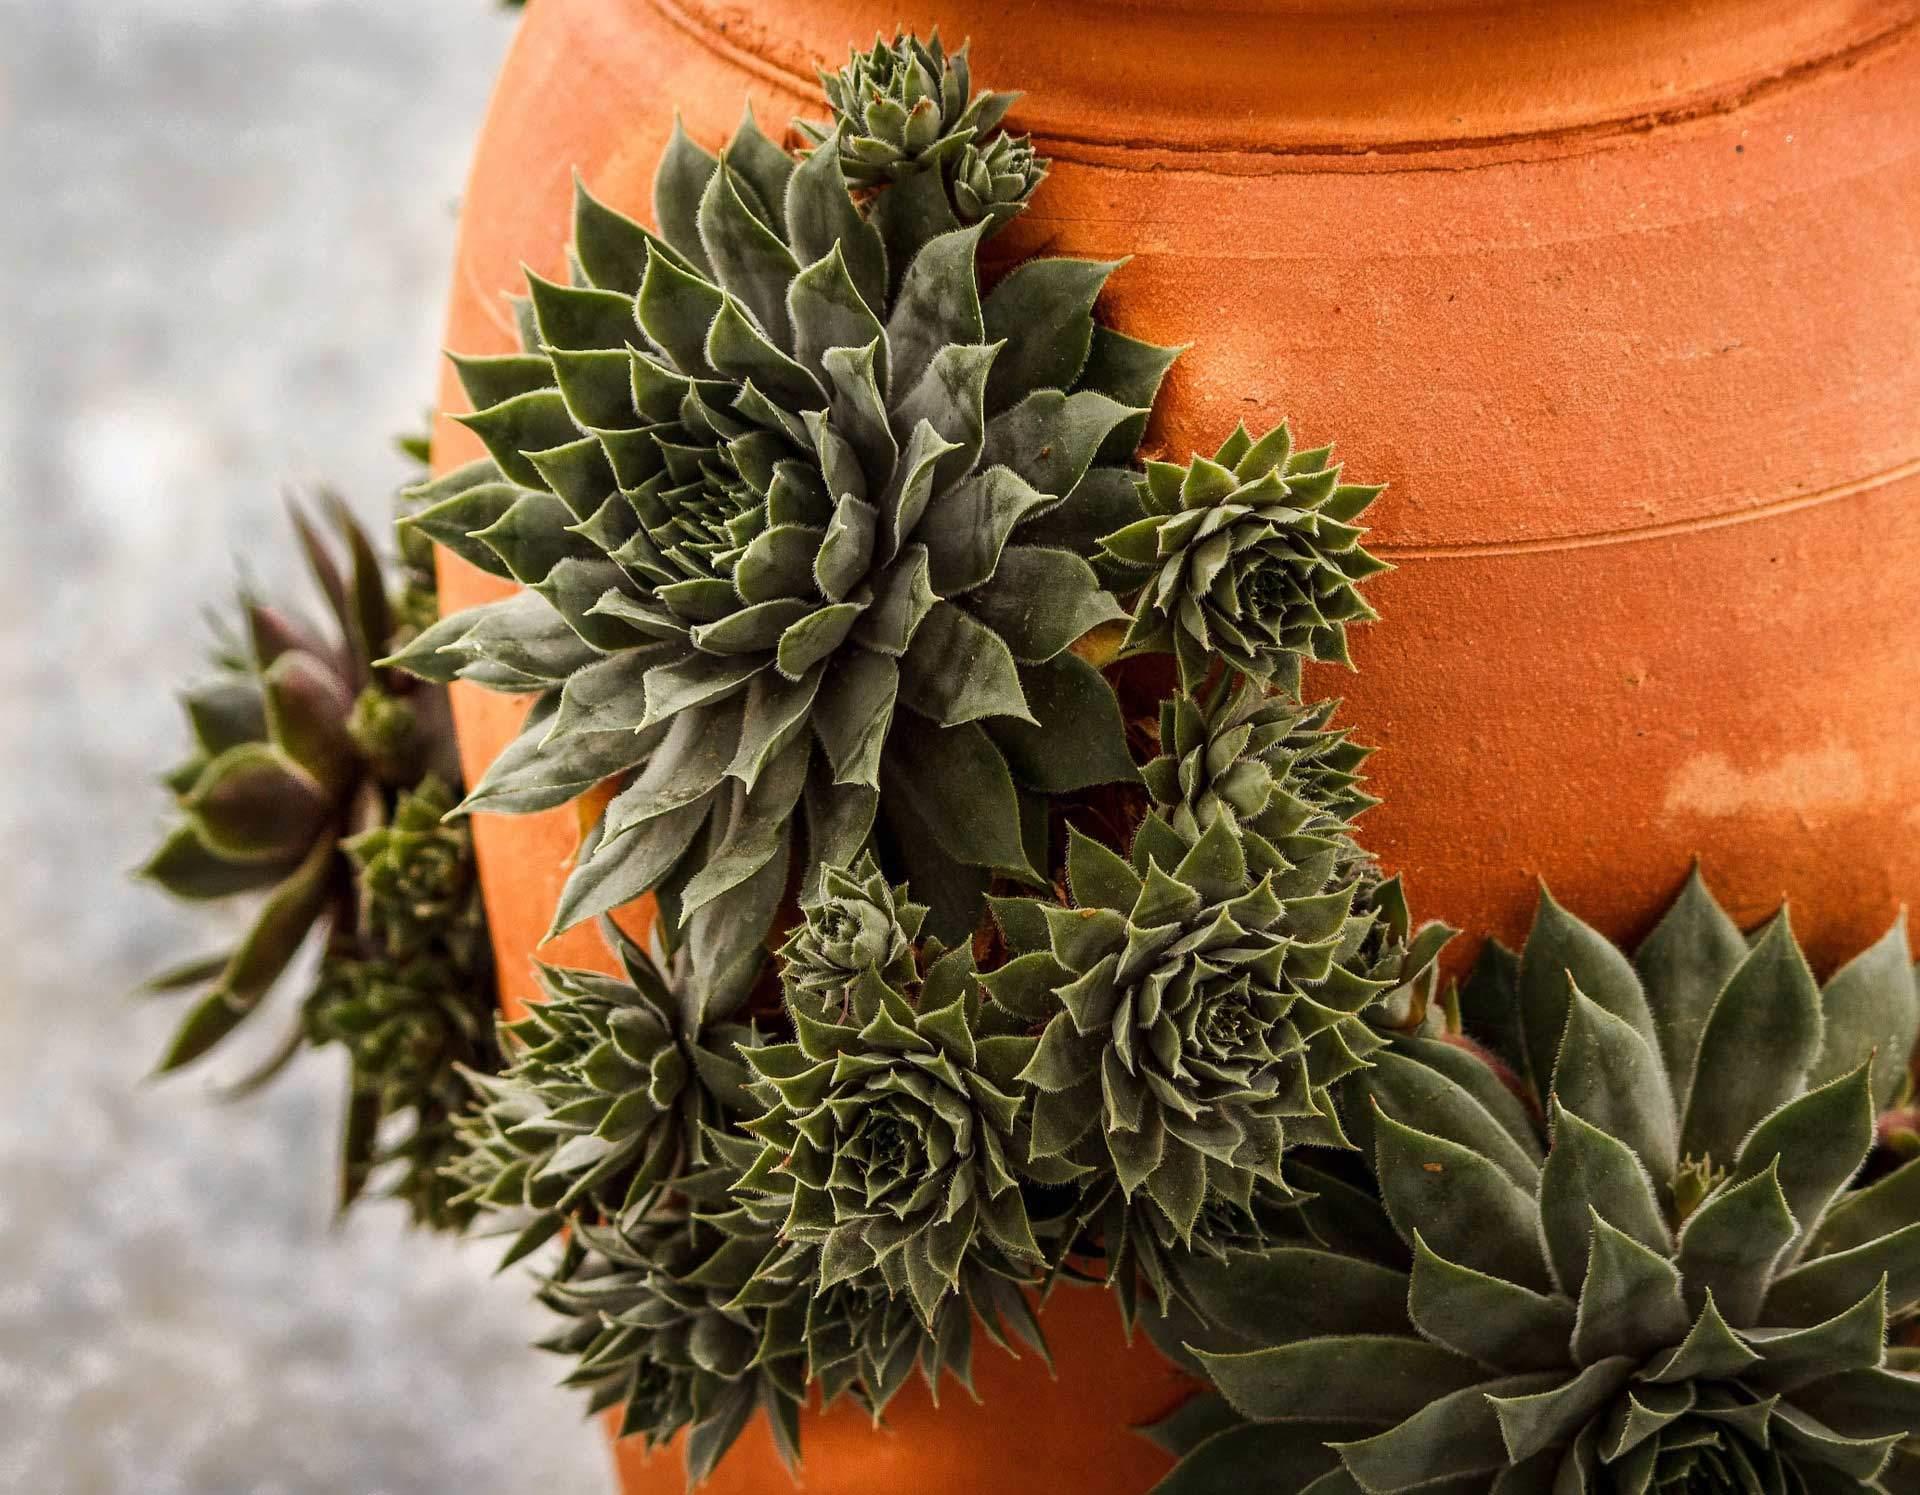 I Have A Pot, So I Will Garden